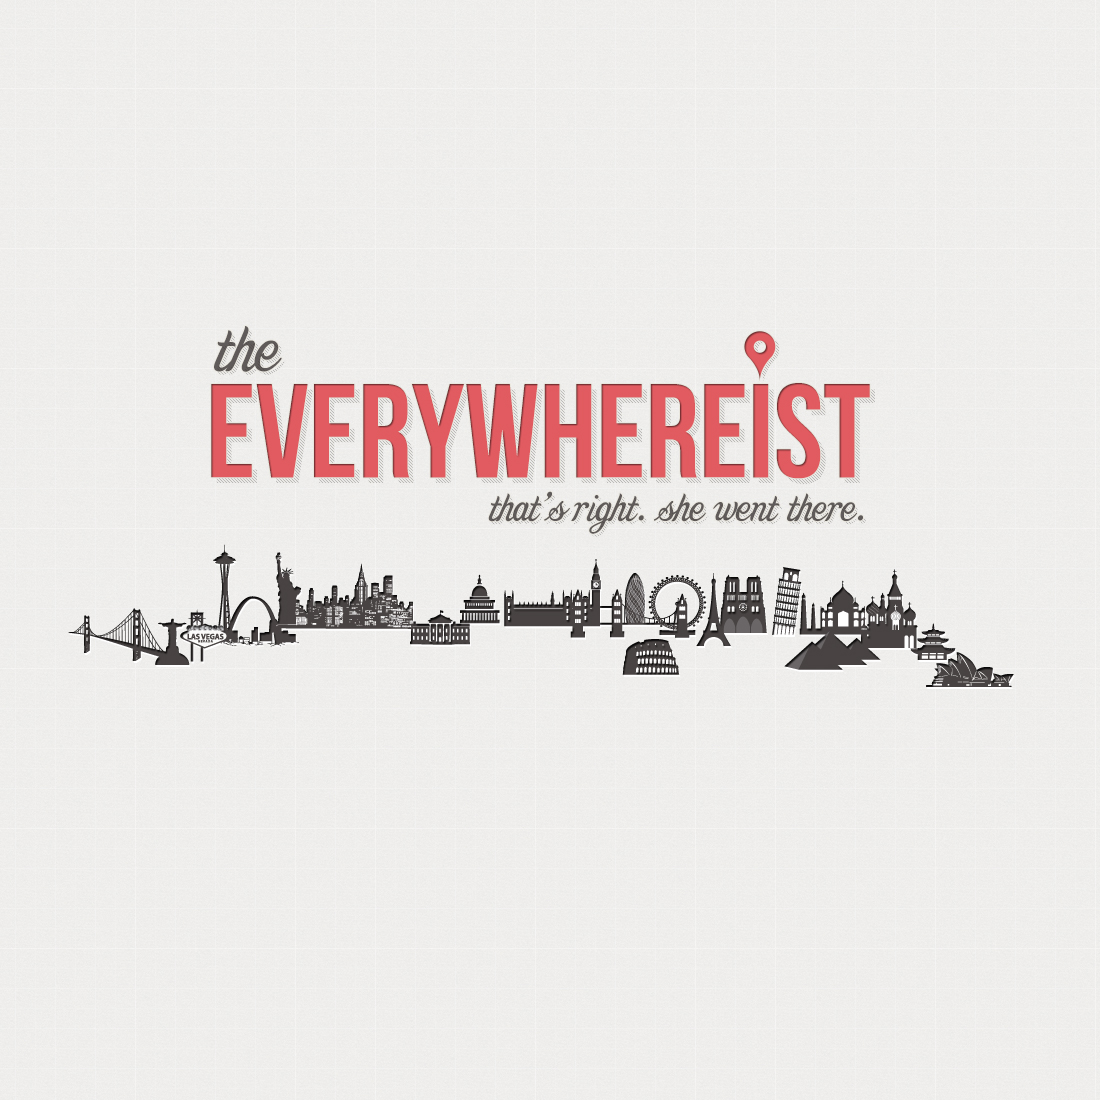 The Everywhereist - Branding and Website Design